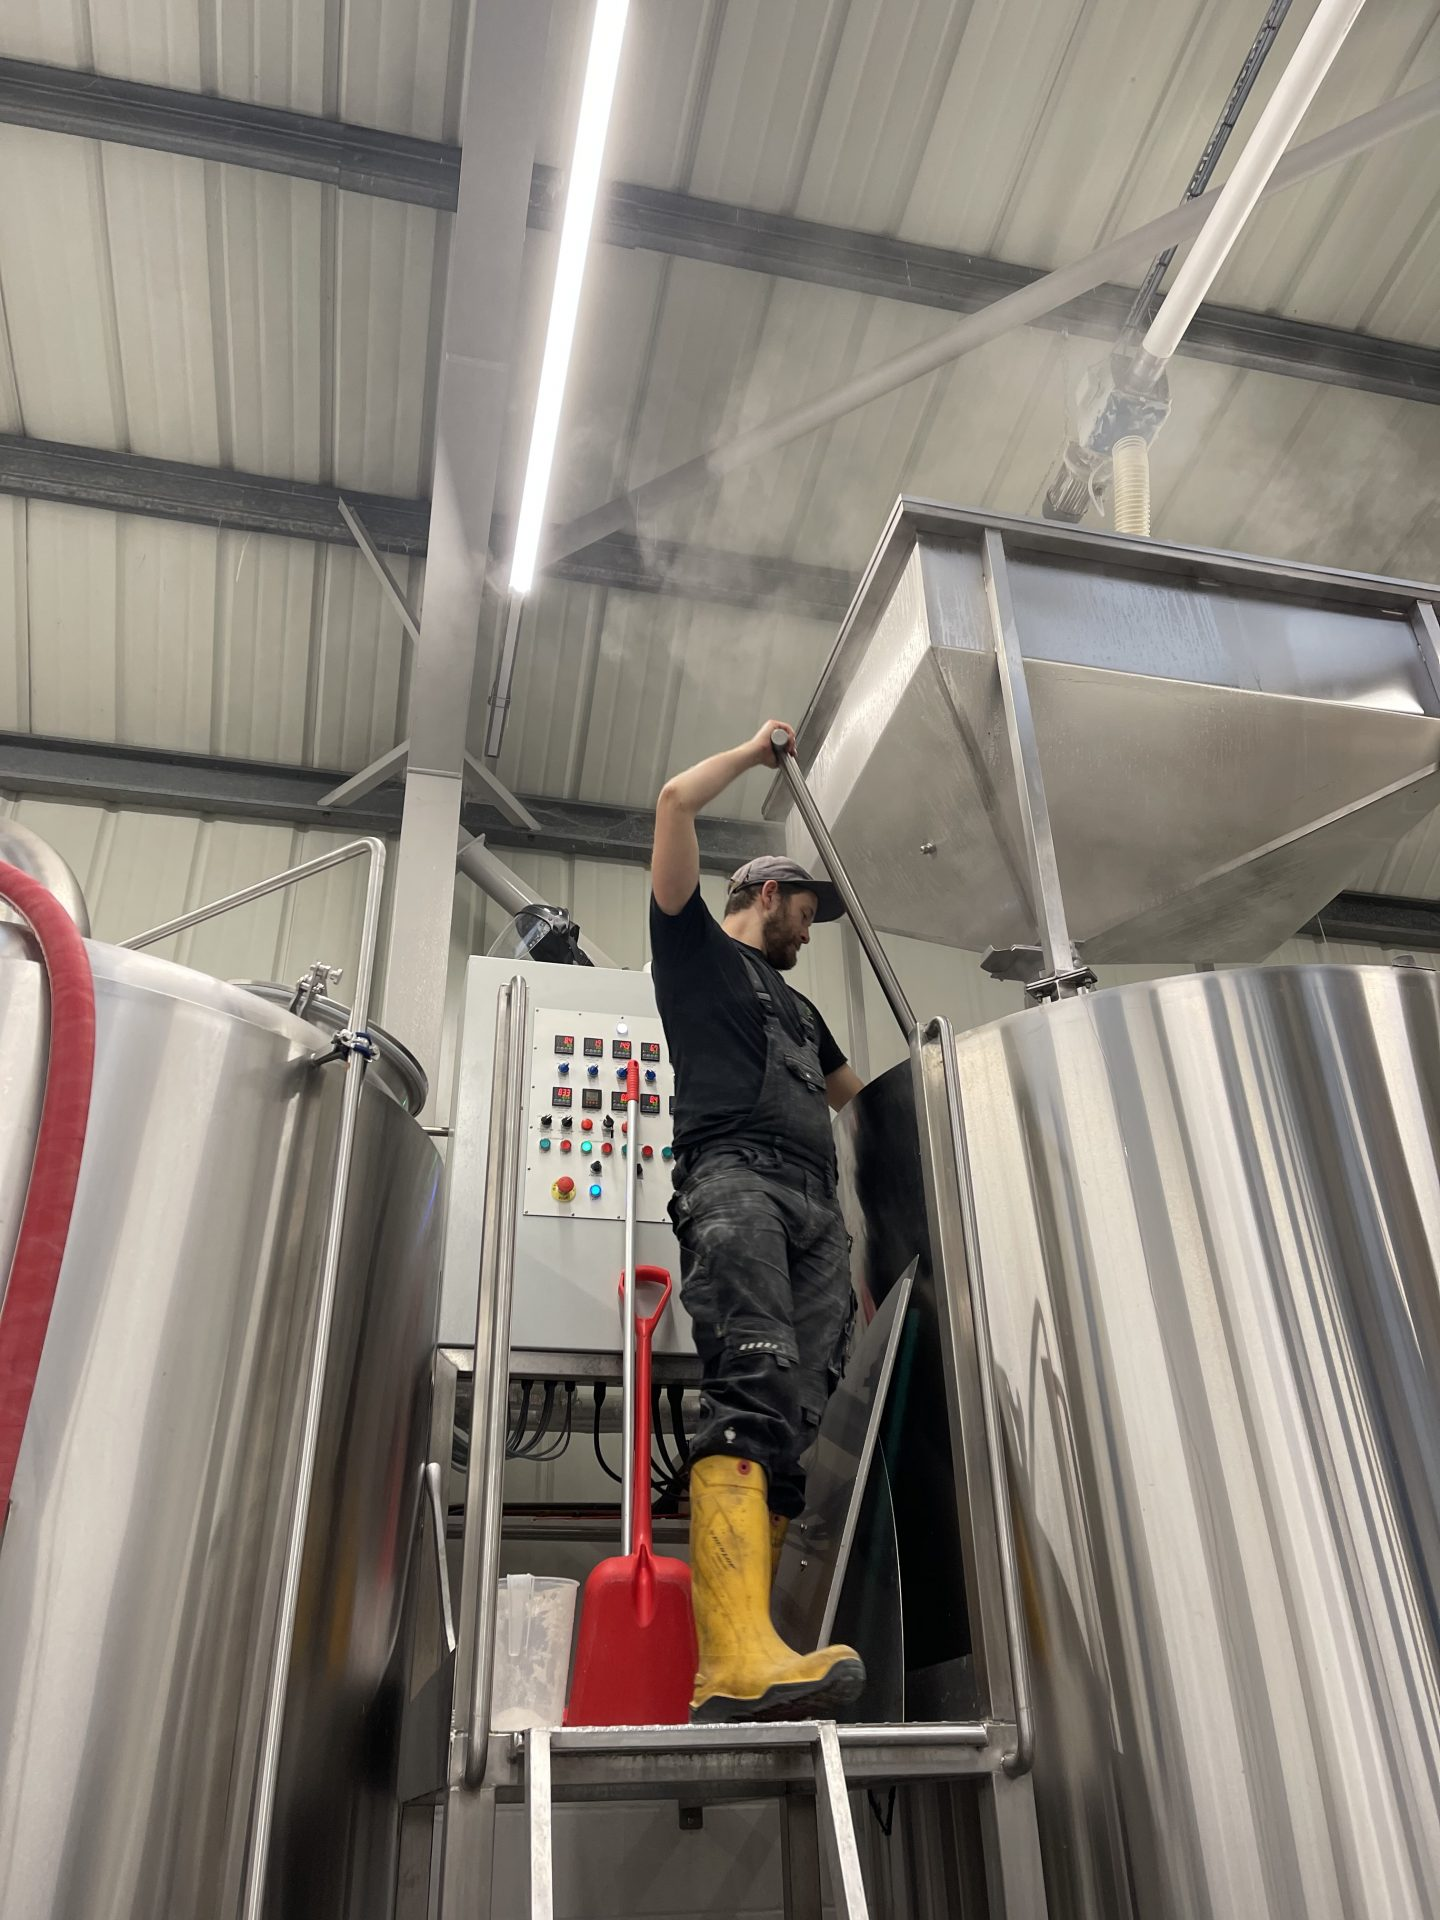 beak brewery stirring the mash tun